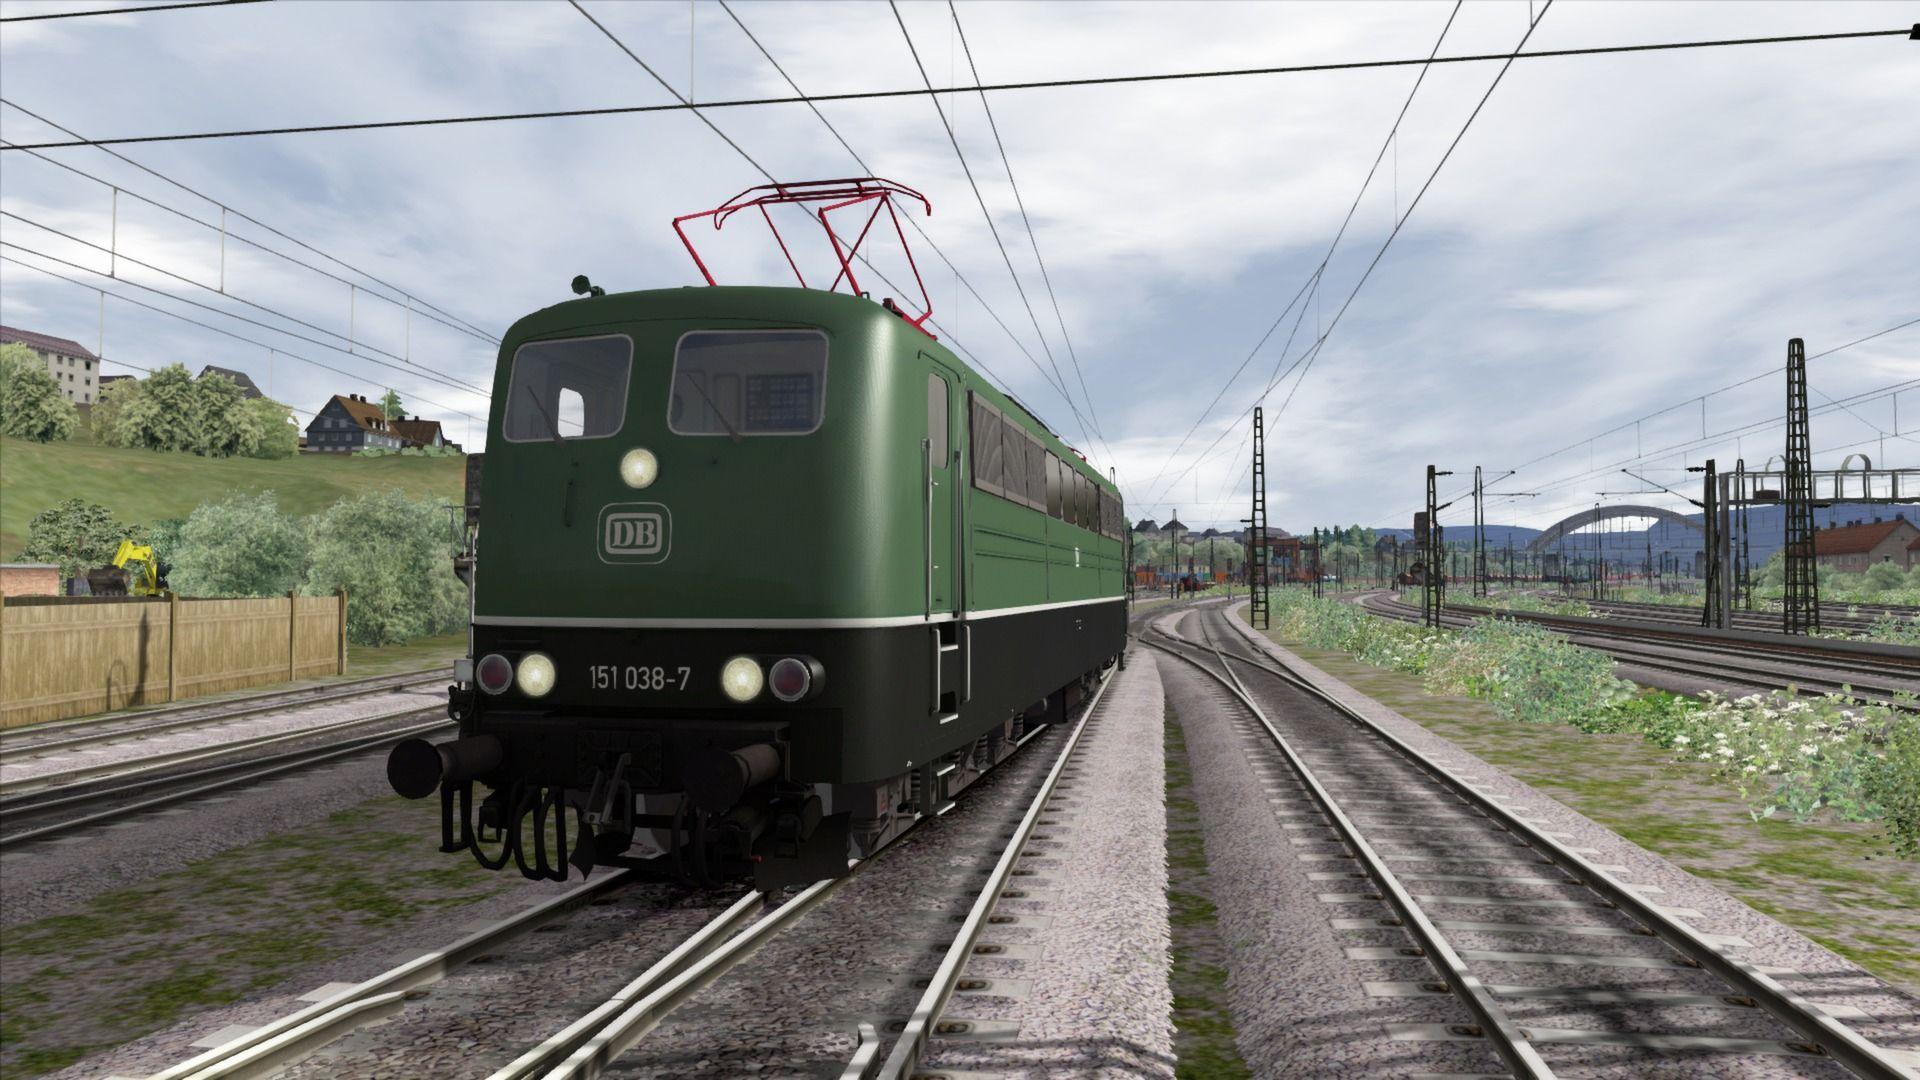 DB19704